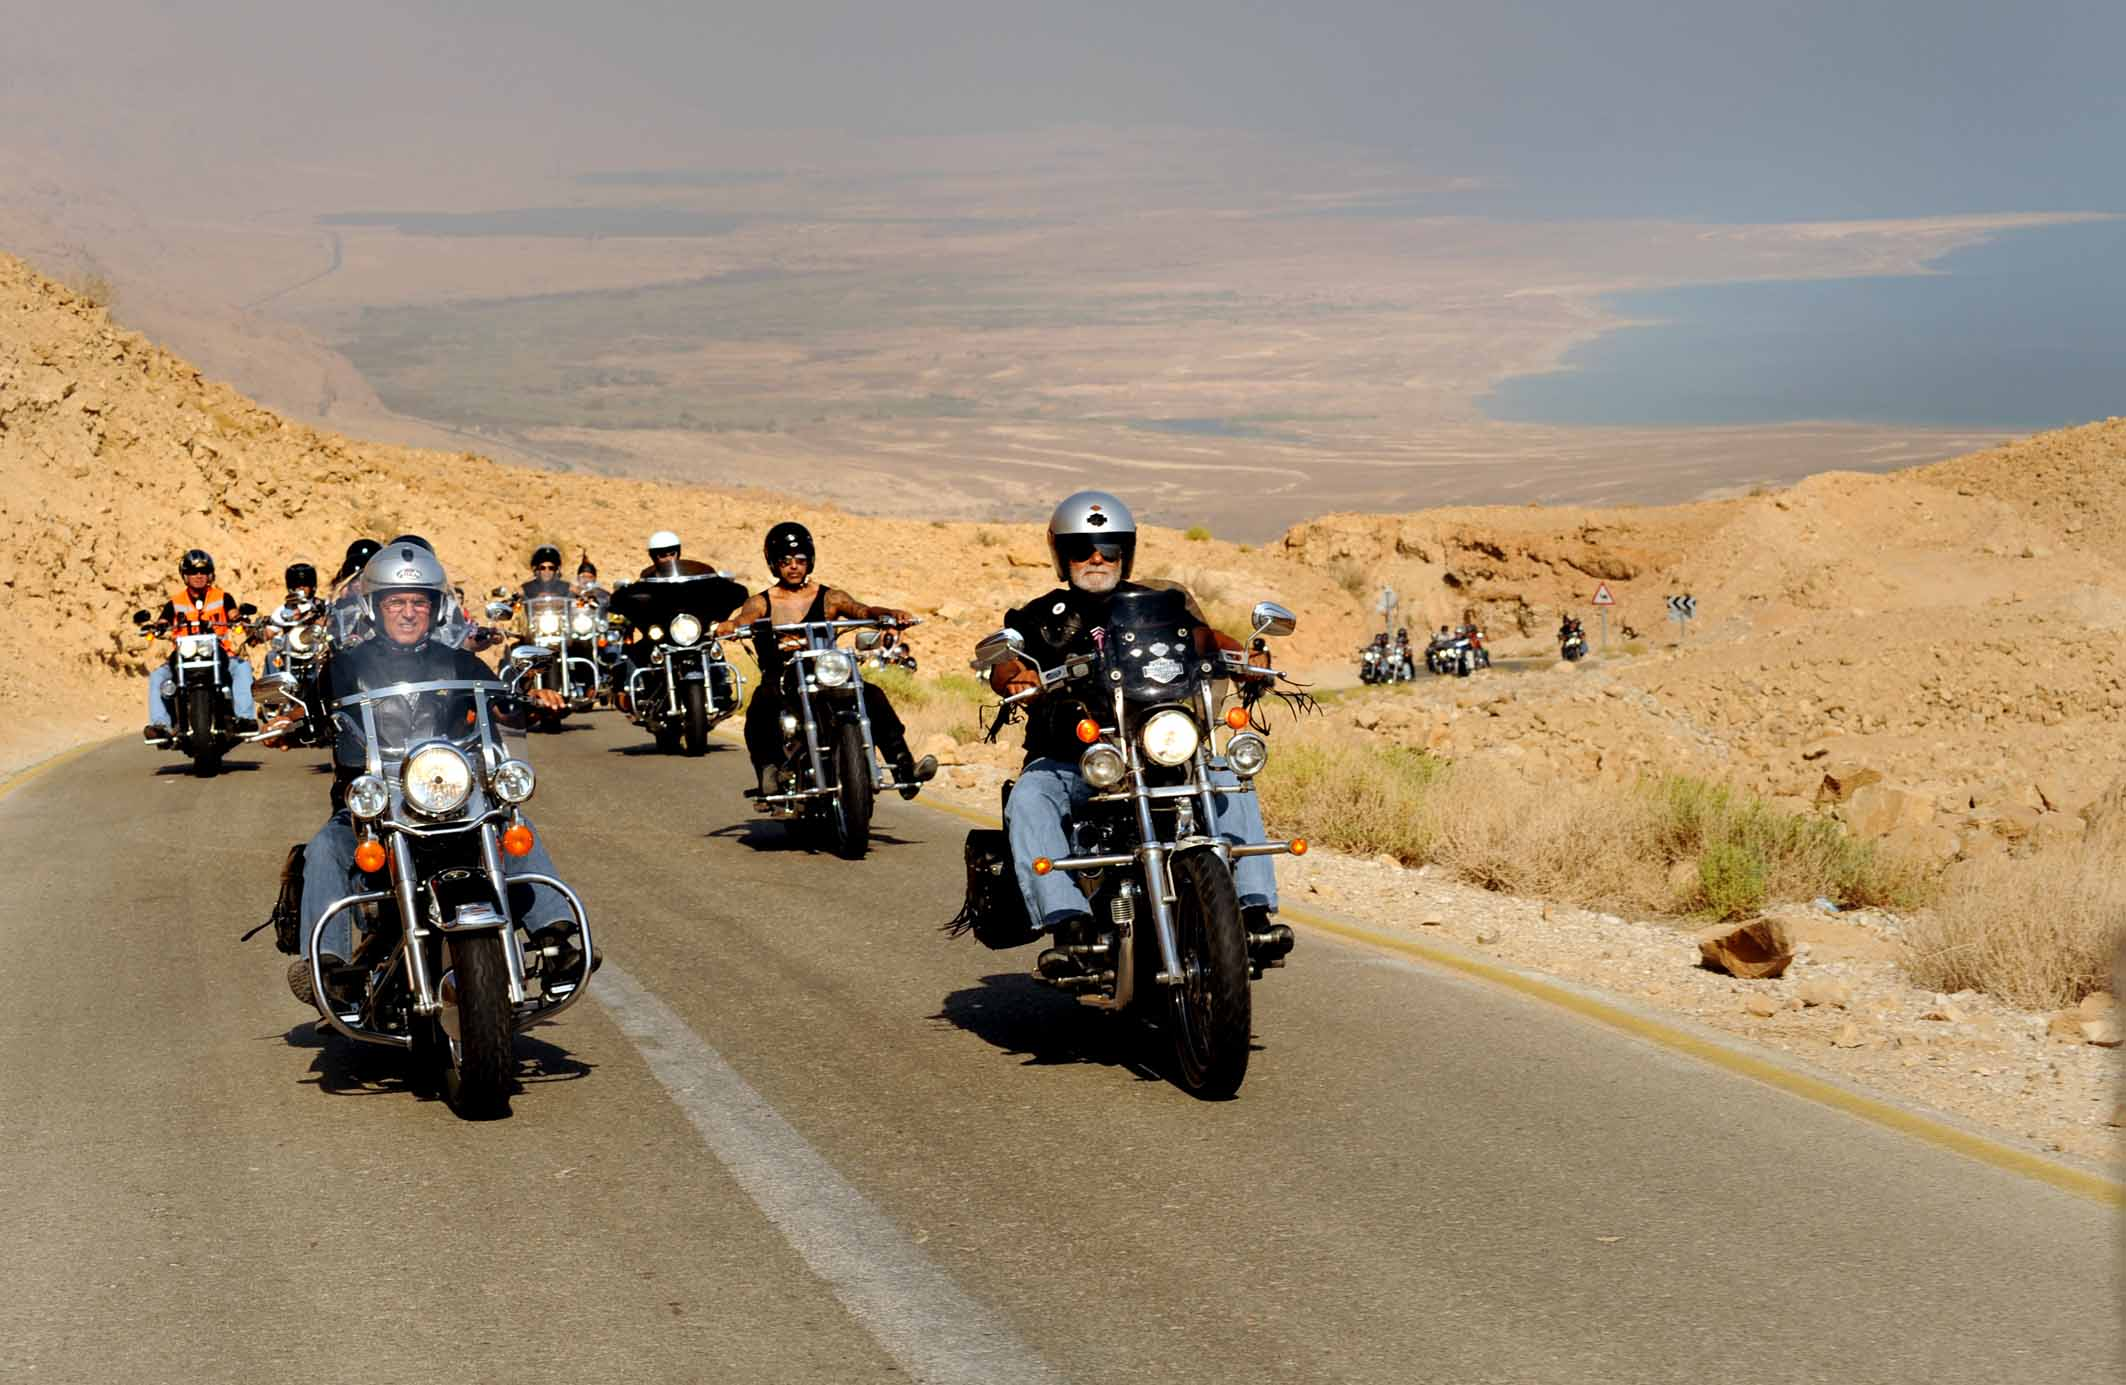 Harley Riders: Israel Harley Davidson Riders Club In The Dead Sea. Photo